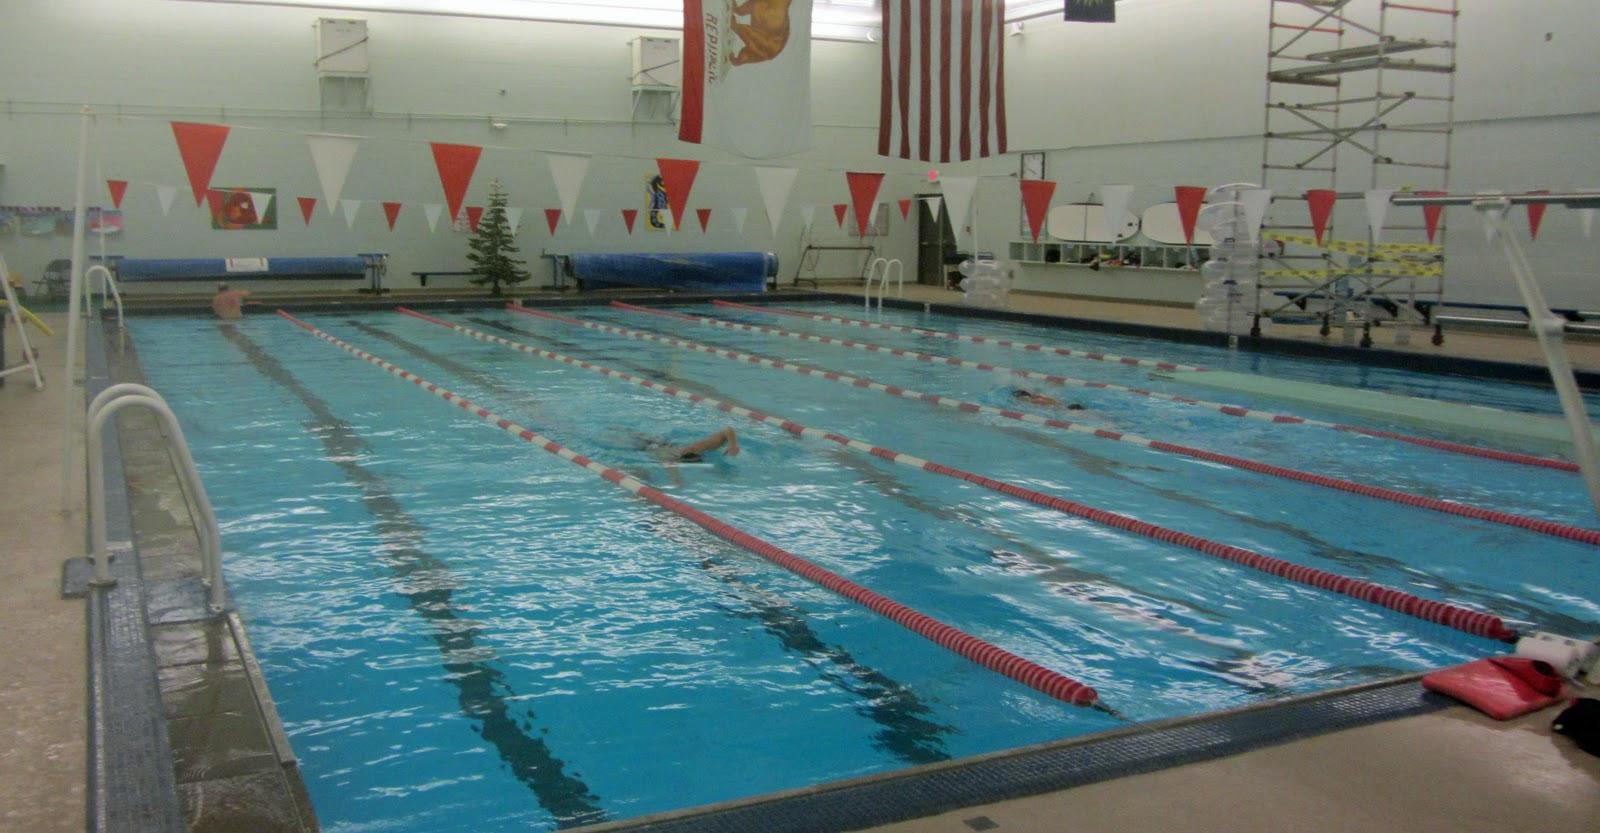 Tahoe truckee outdoor lap swimming in tahoe truckee - Reno hotels with indoor swimming pool ...